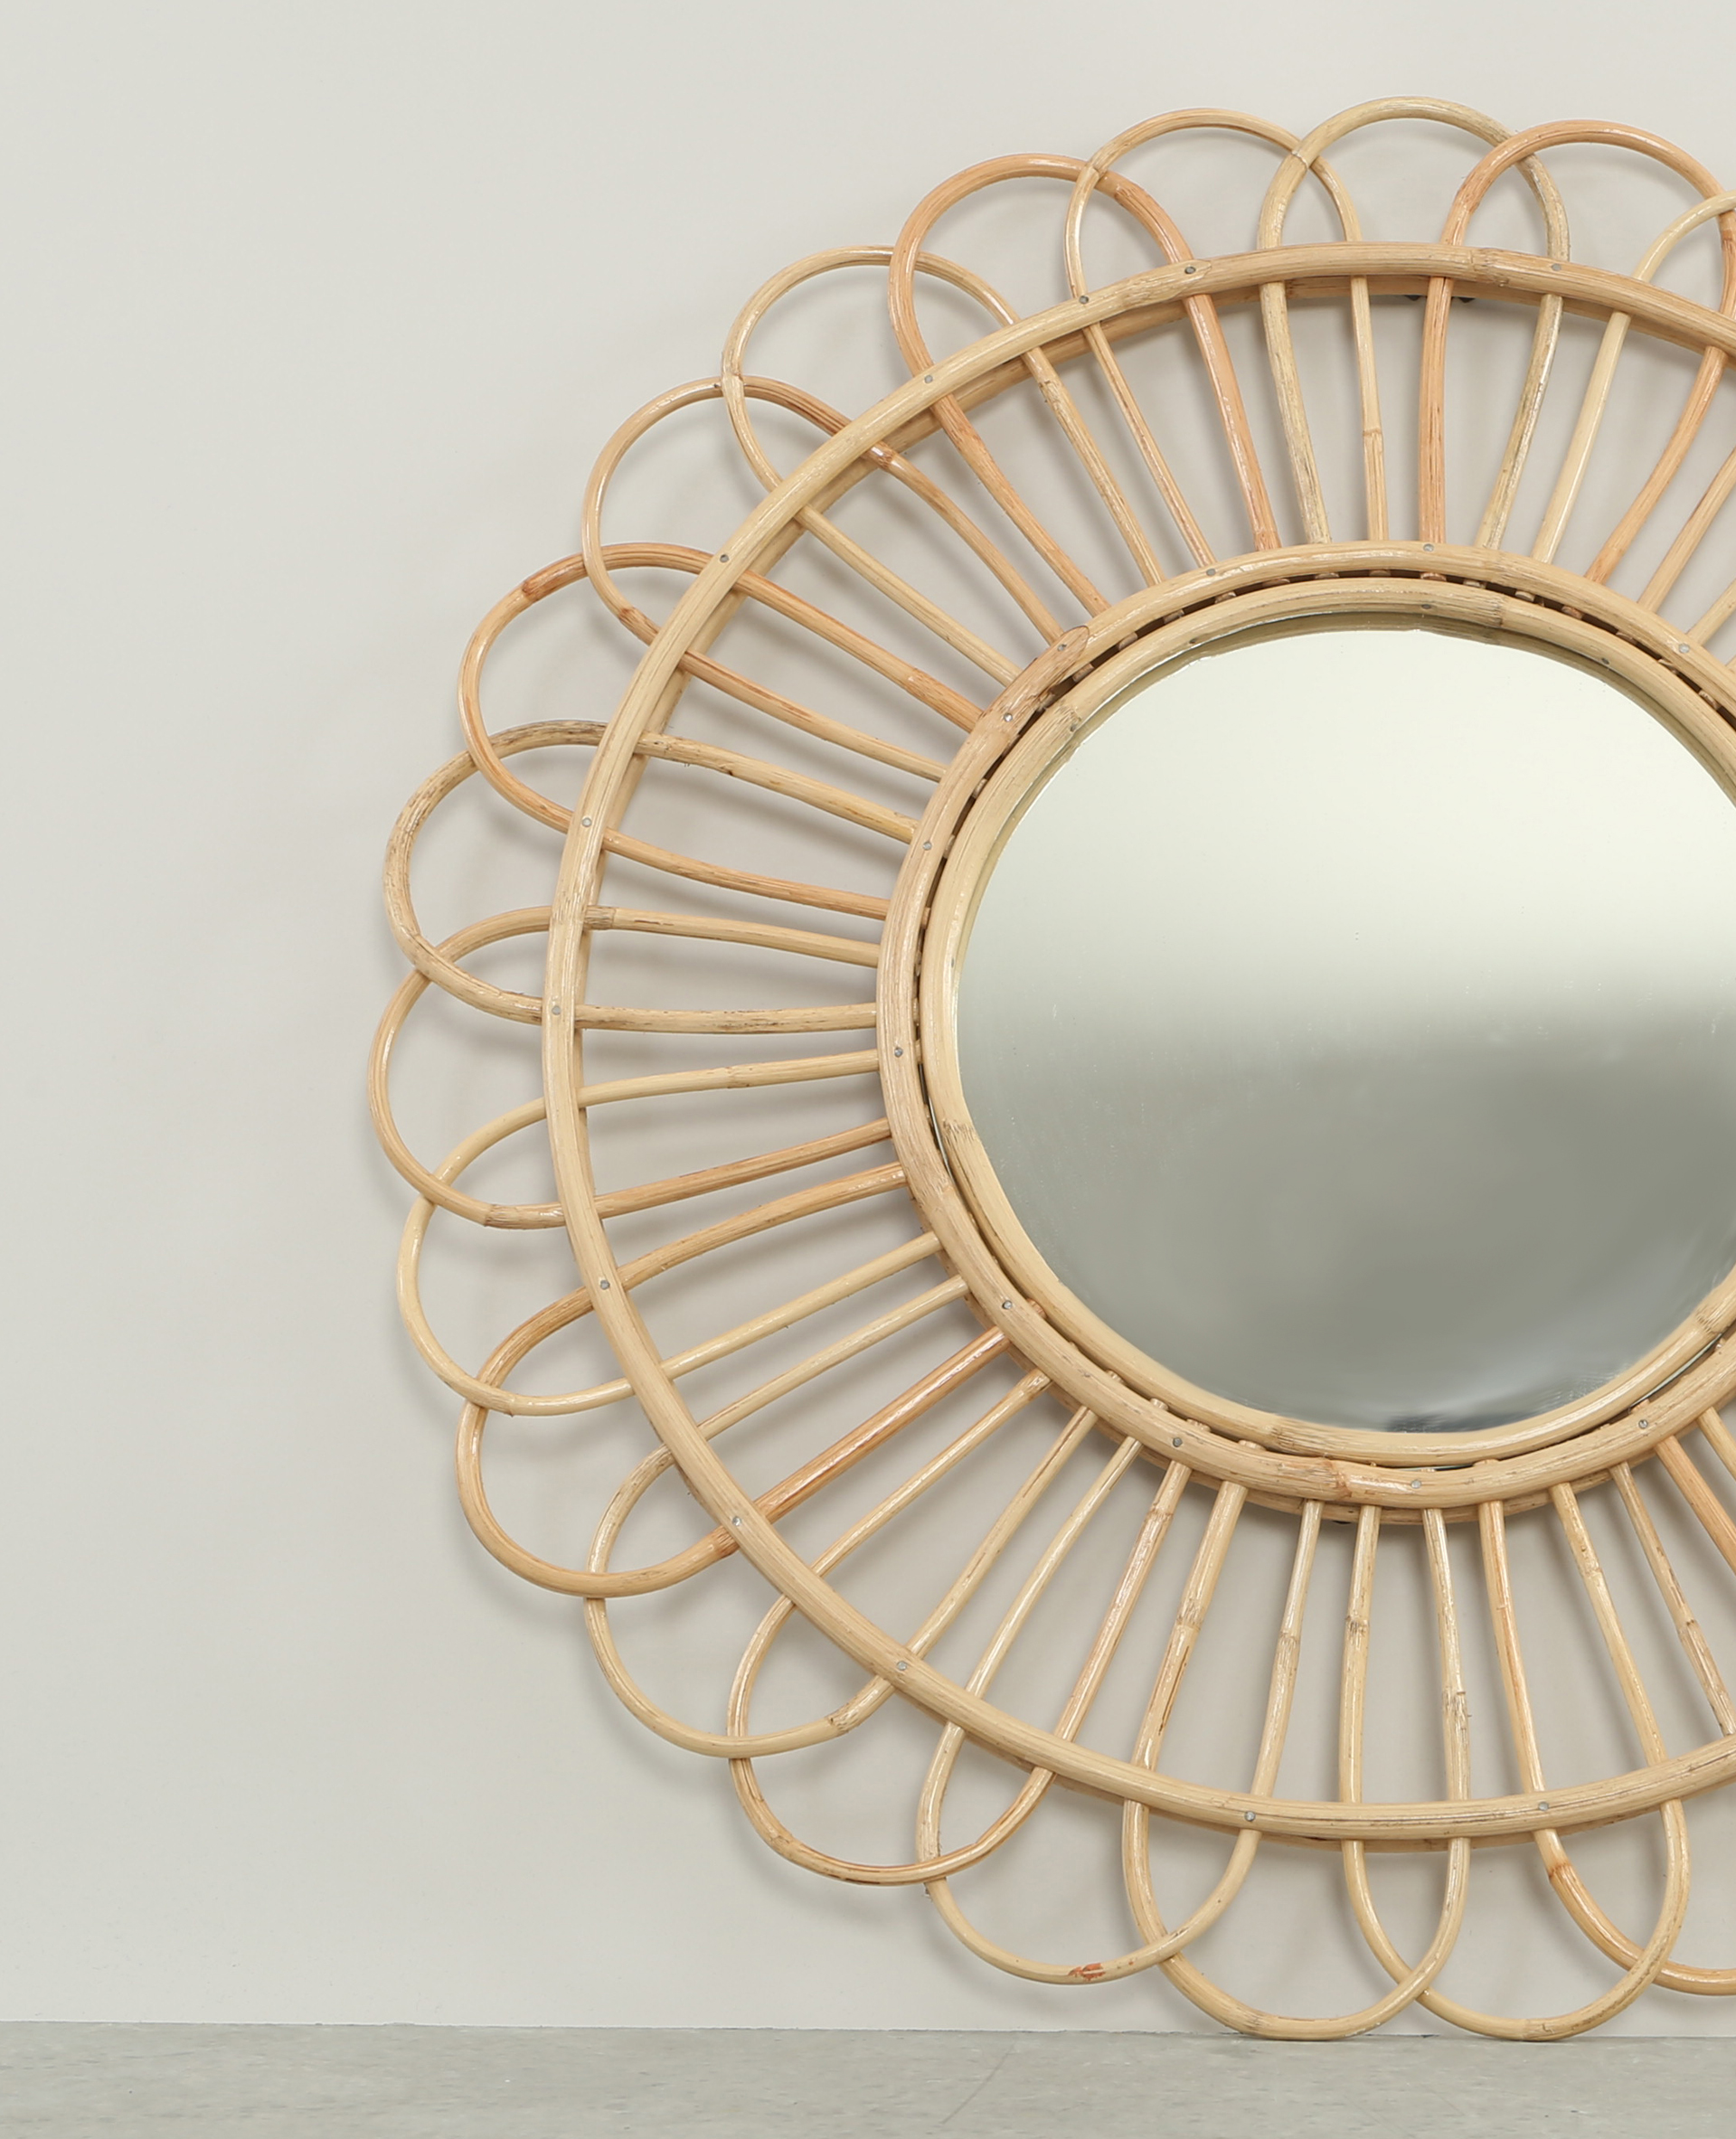 Miroir rond en rotin beige taupe 904073742a07 pimkie for Miroir en rotin